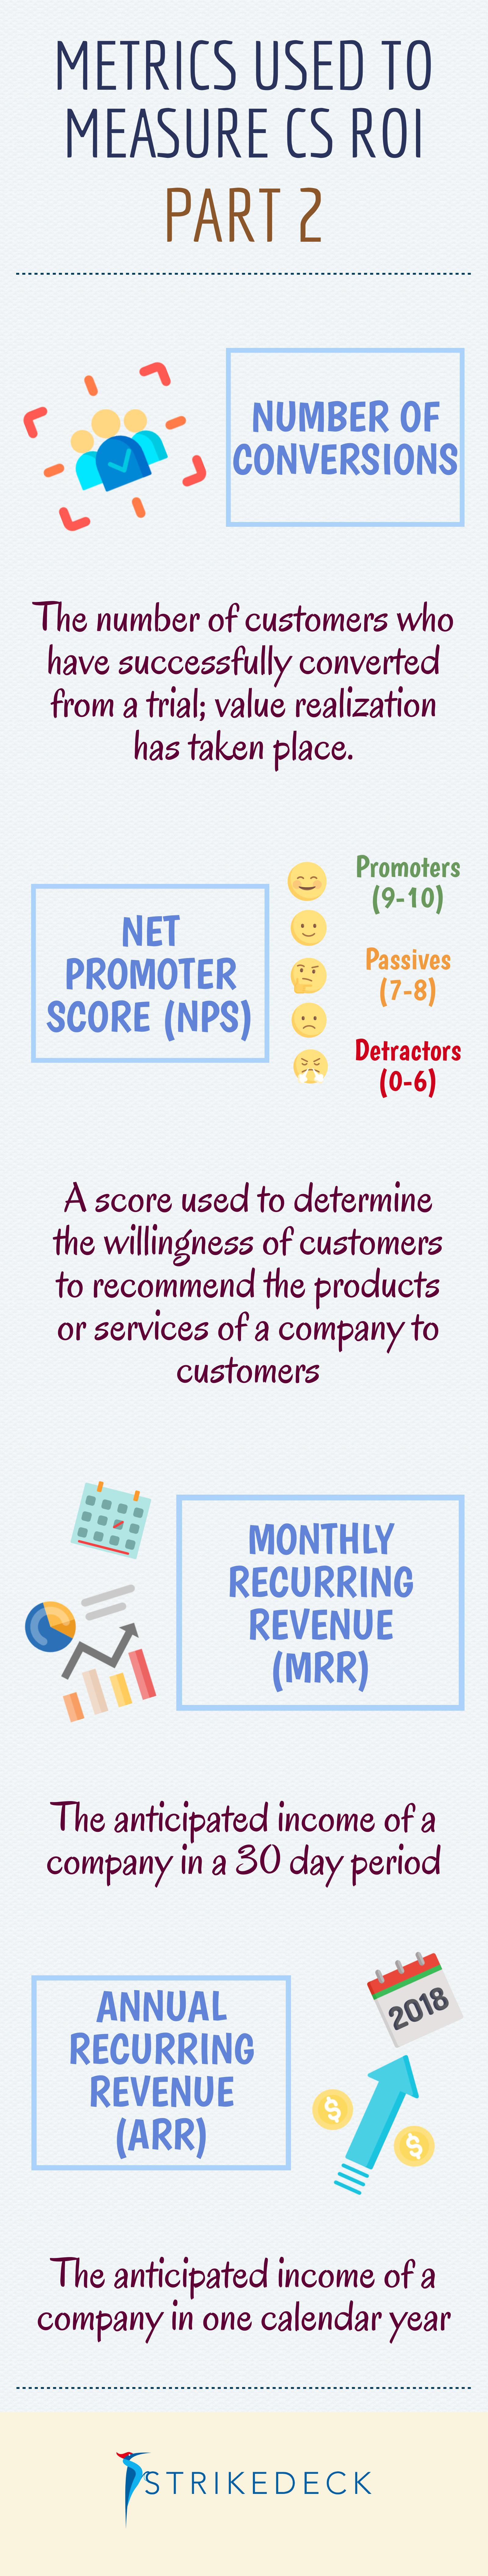 Metrics-Used-to-Measure-CS-ROI-P2-Infographic